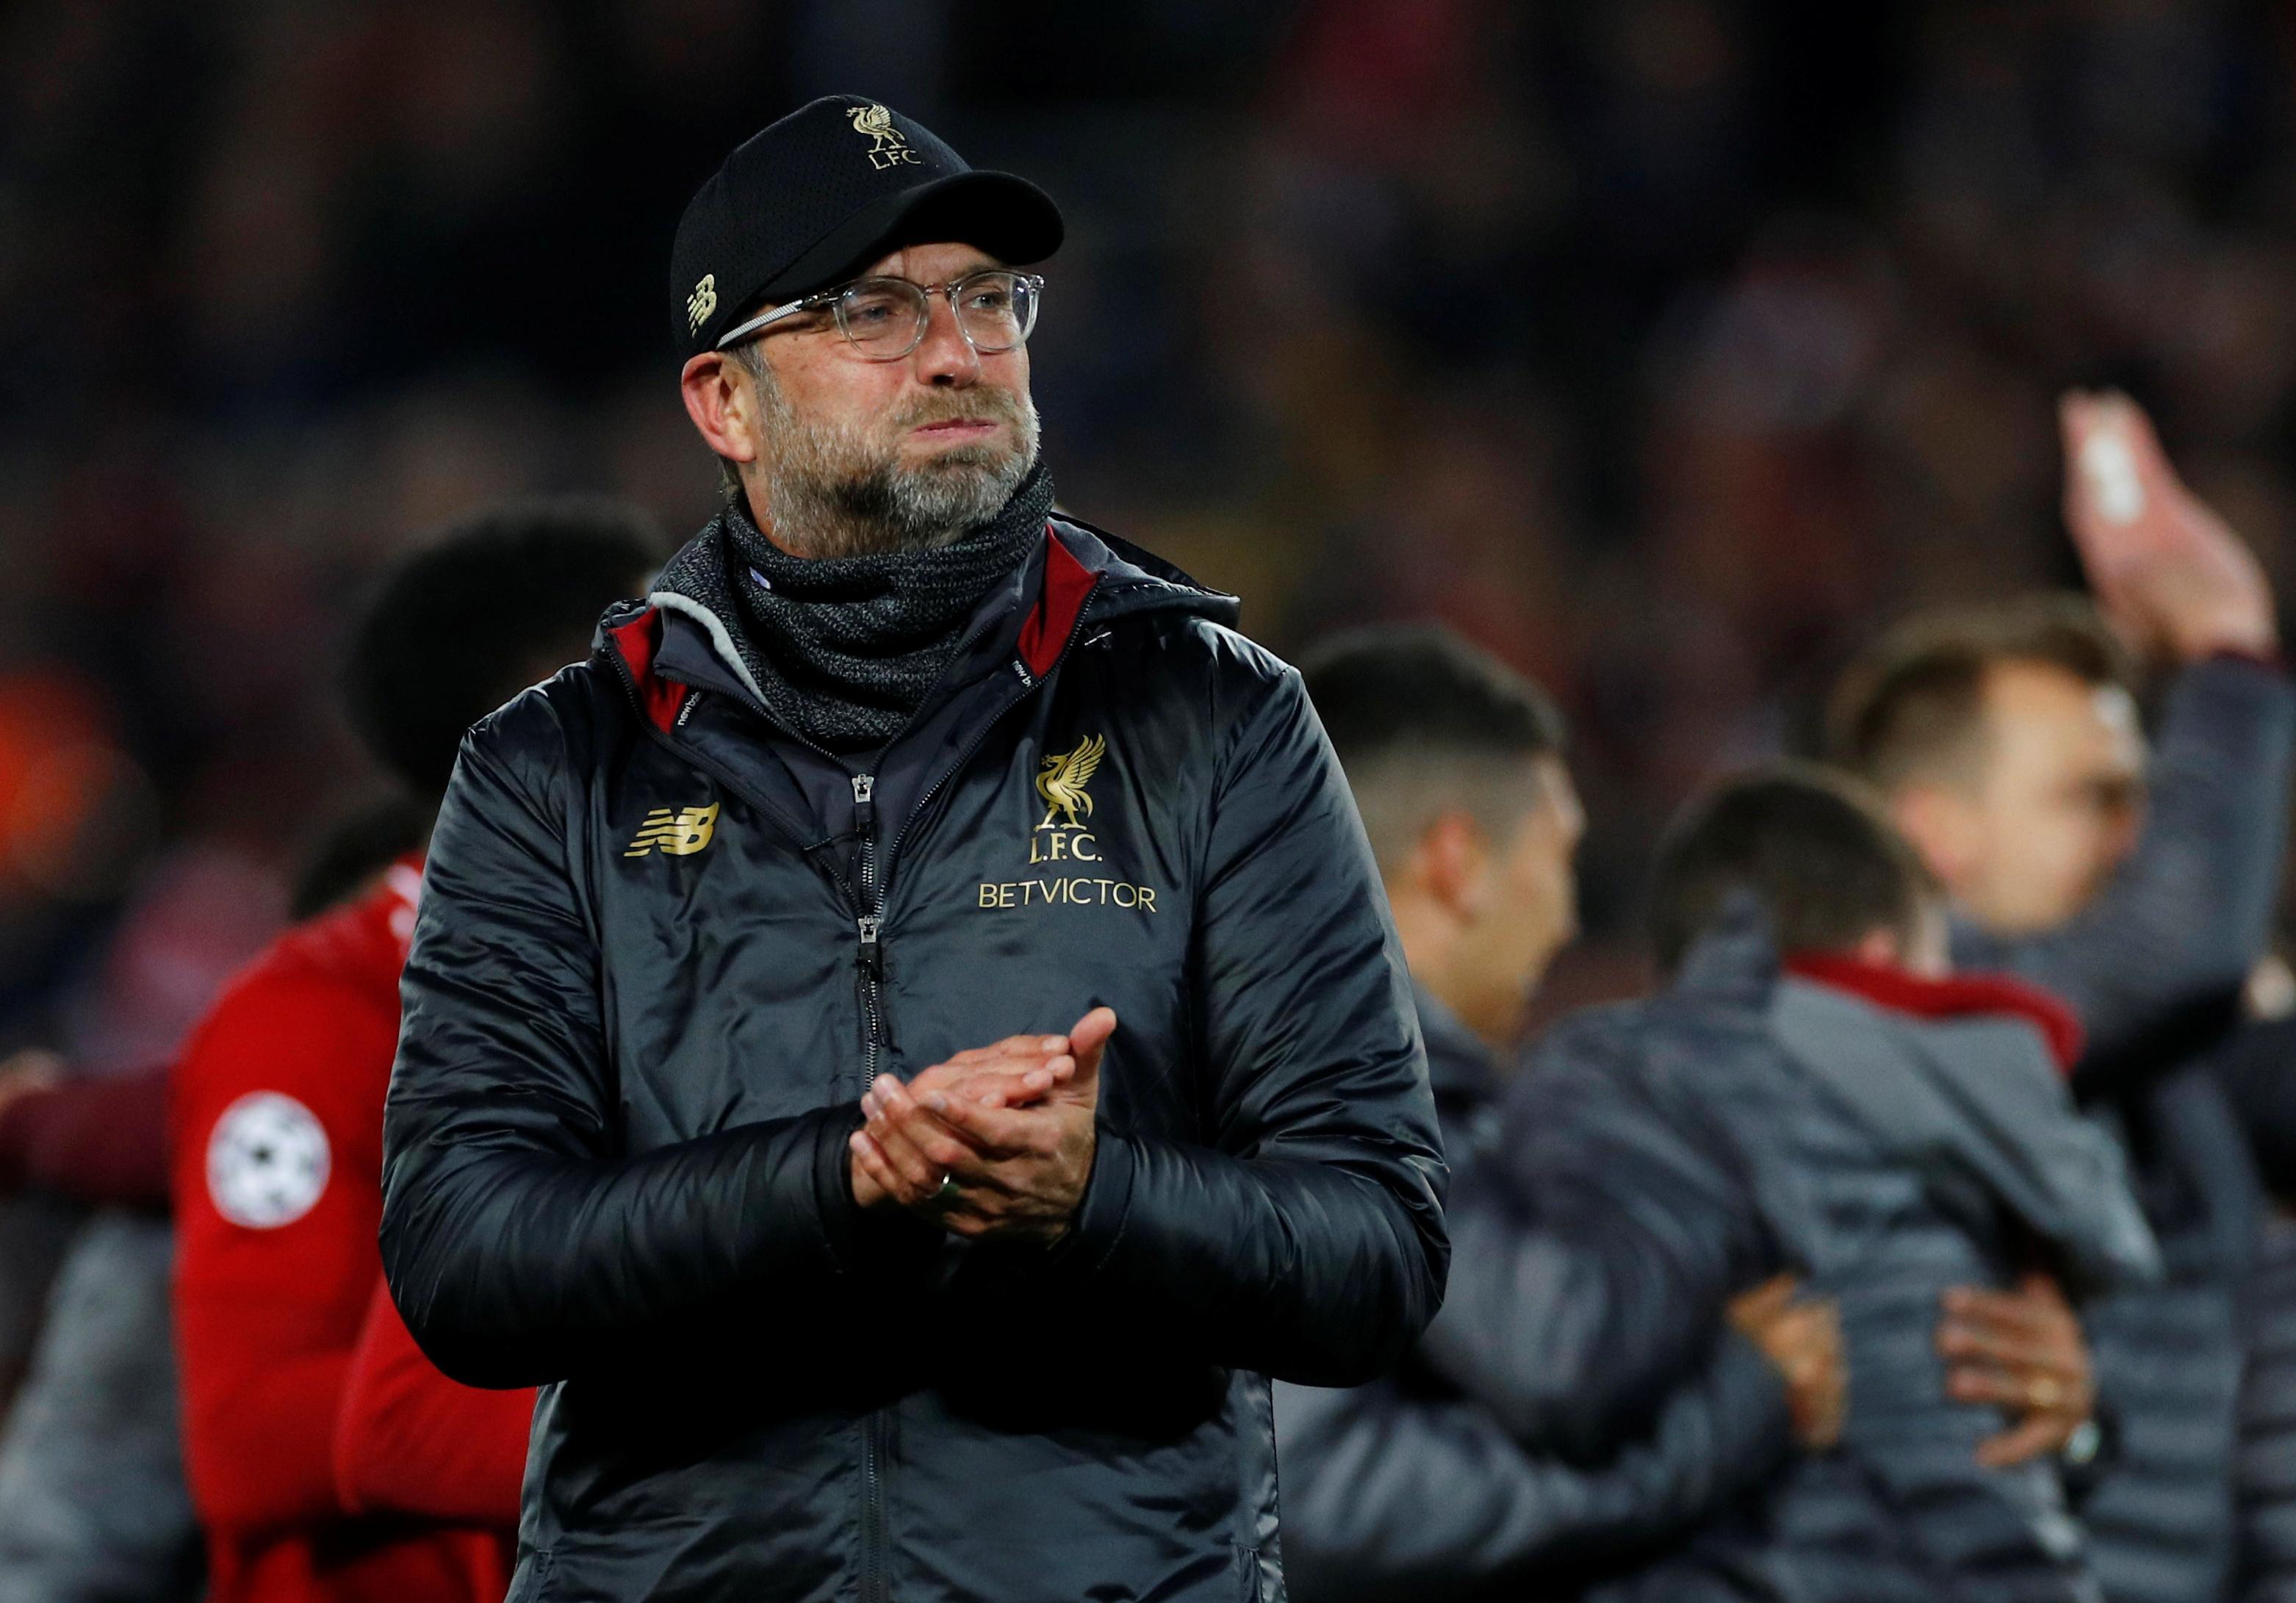 Soccer: Irresponsible to play Europa League final in Baku